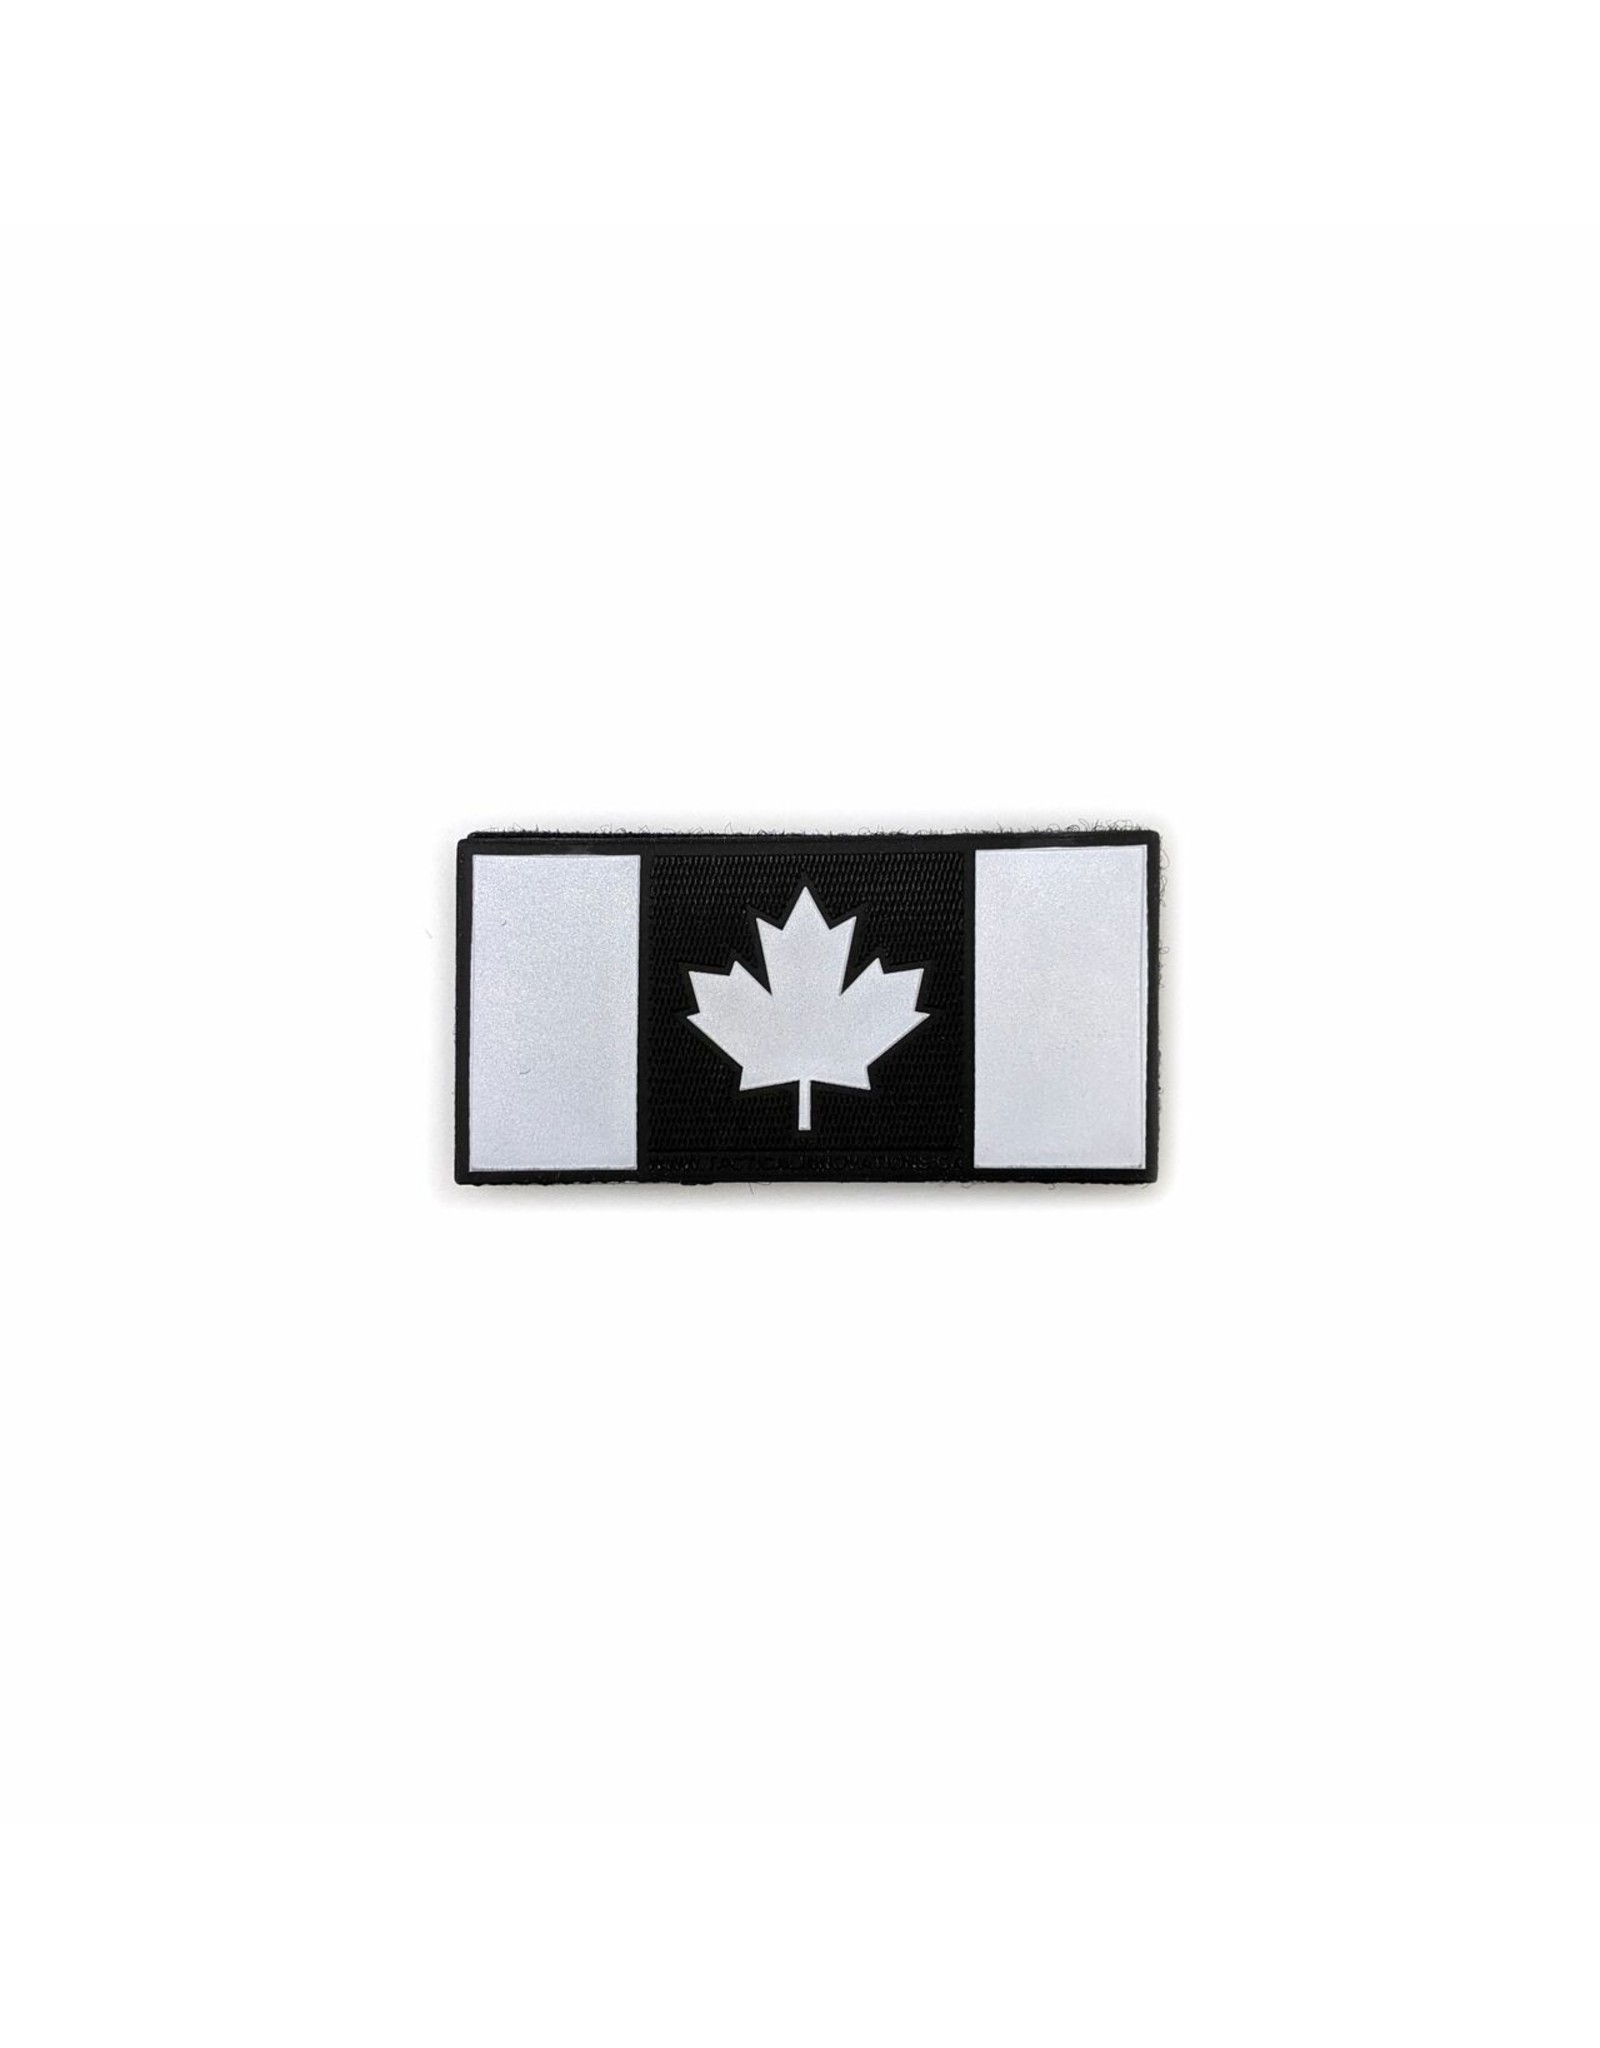 TIC Patch - Hi Vis Reflective Patch CANADA FLAG BLACK 1.5X3